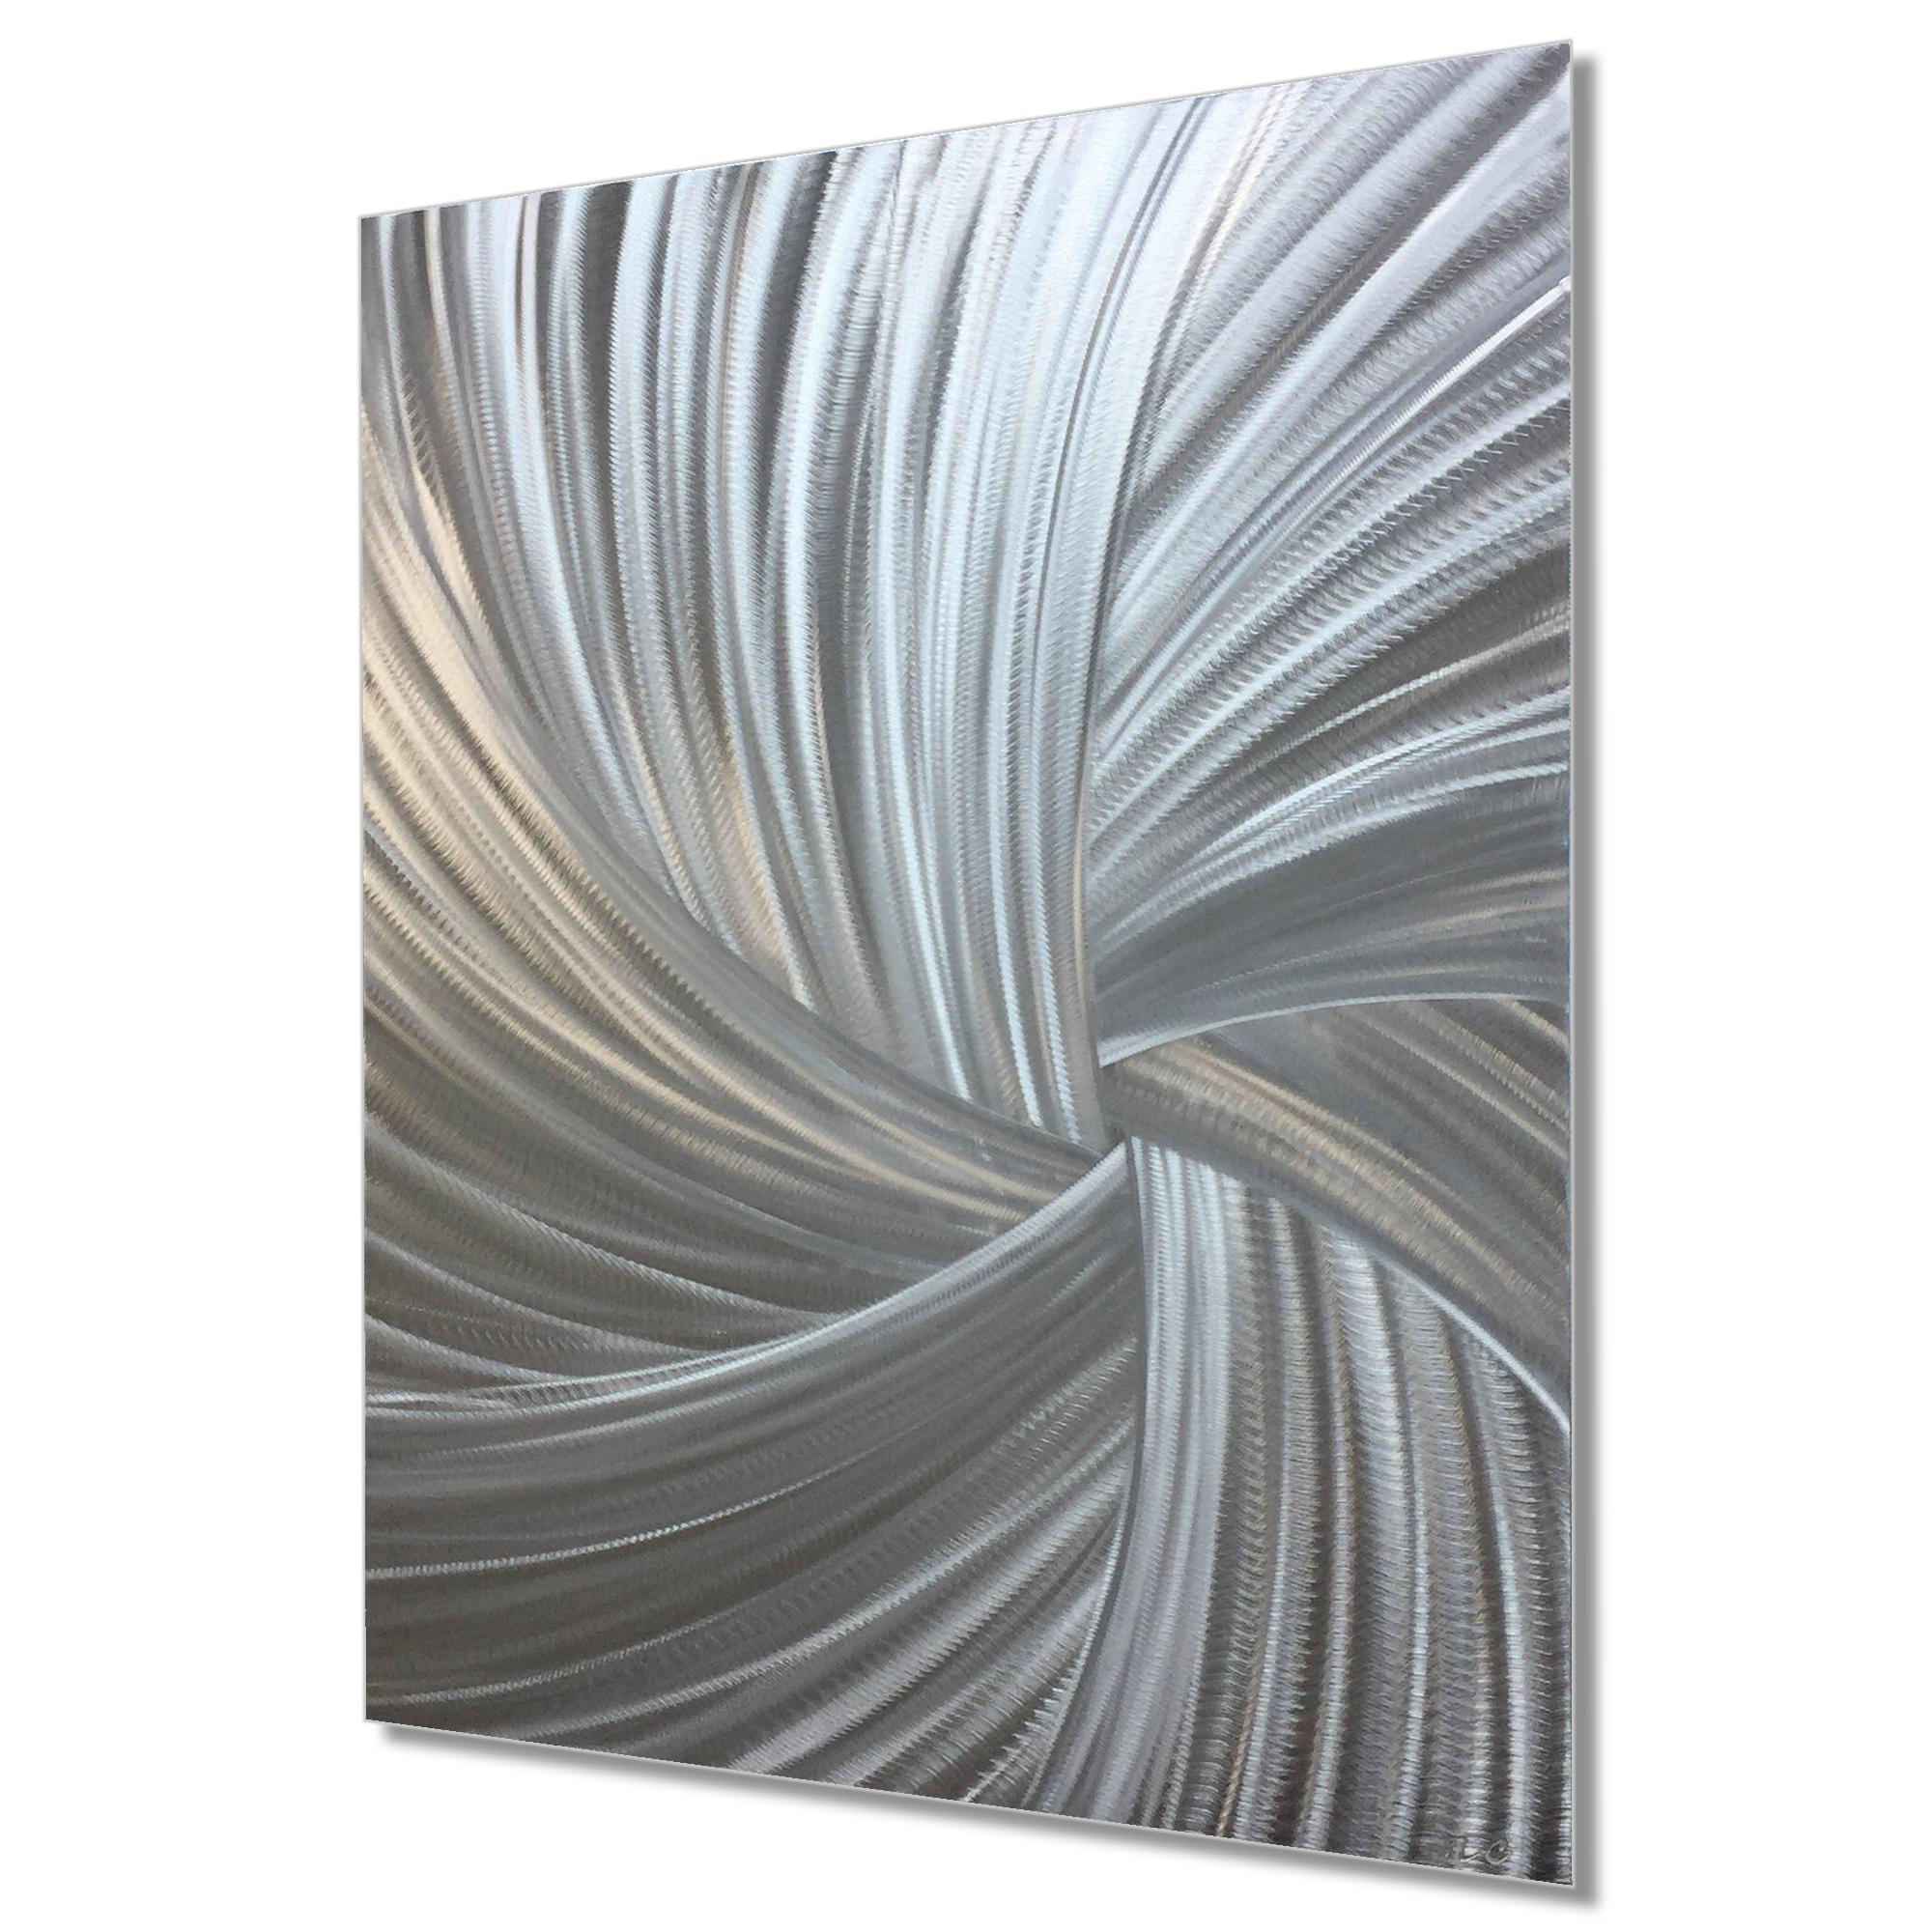 Starburst Metal Art 'Within the Folds' - Modern Artwork on Natural Aluminum - Image 2